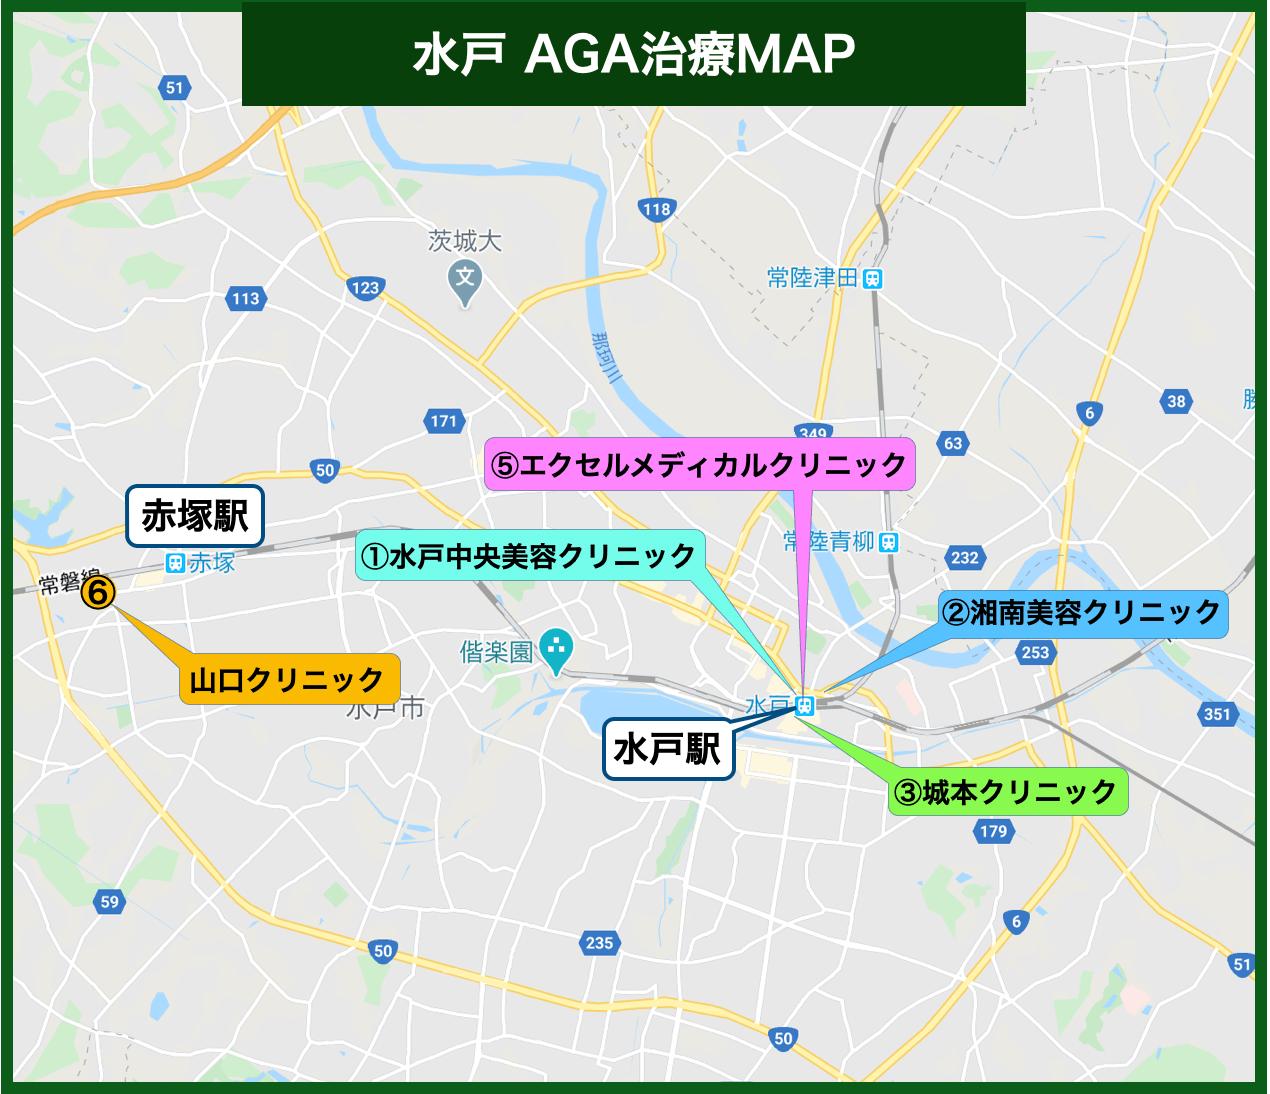 水戸 AGA治療MAP